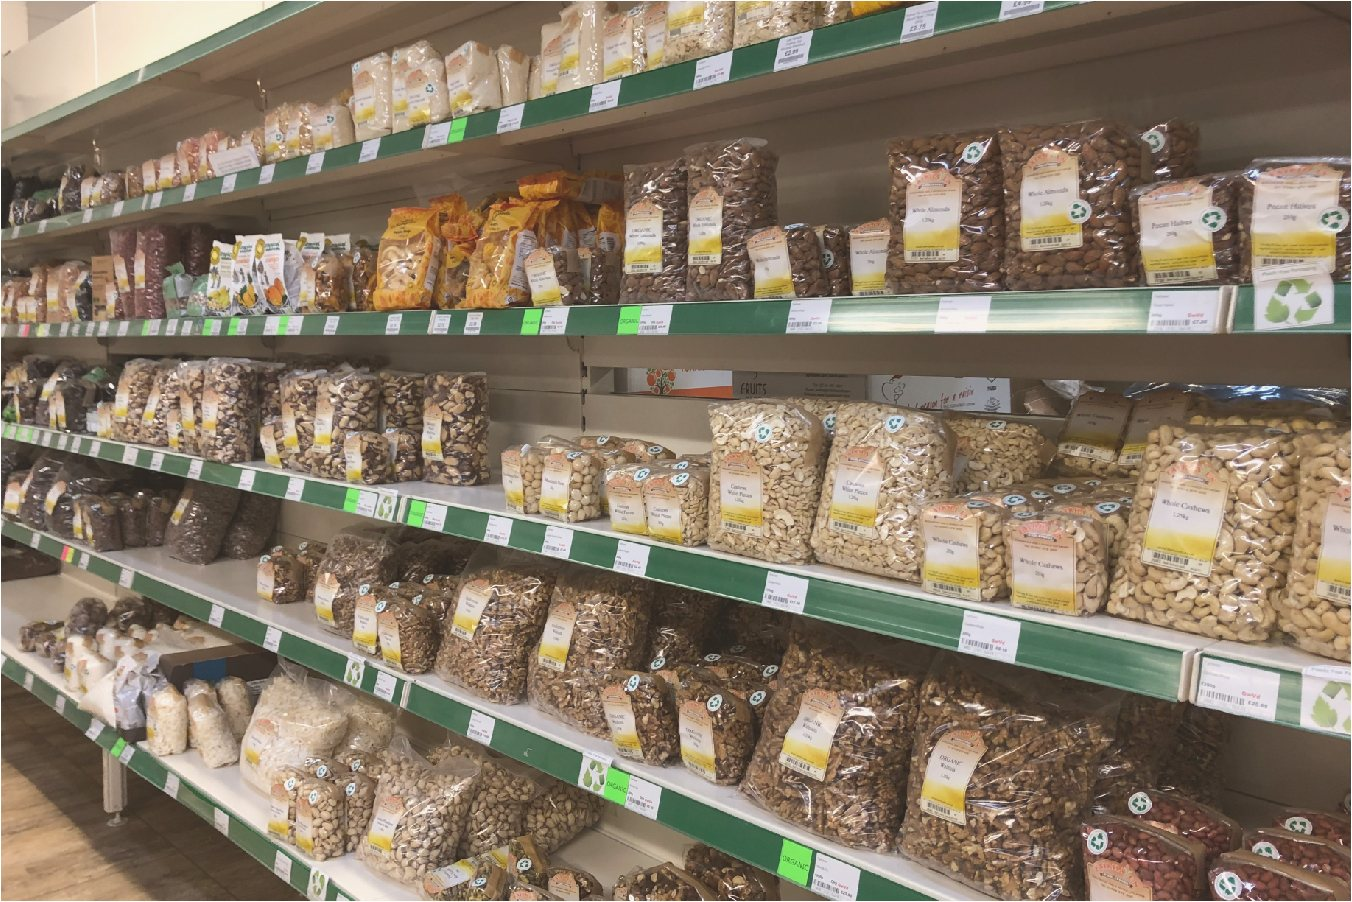 Fairhaven Brand Wholefoods